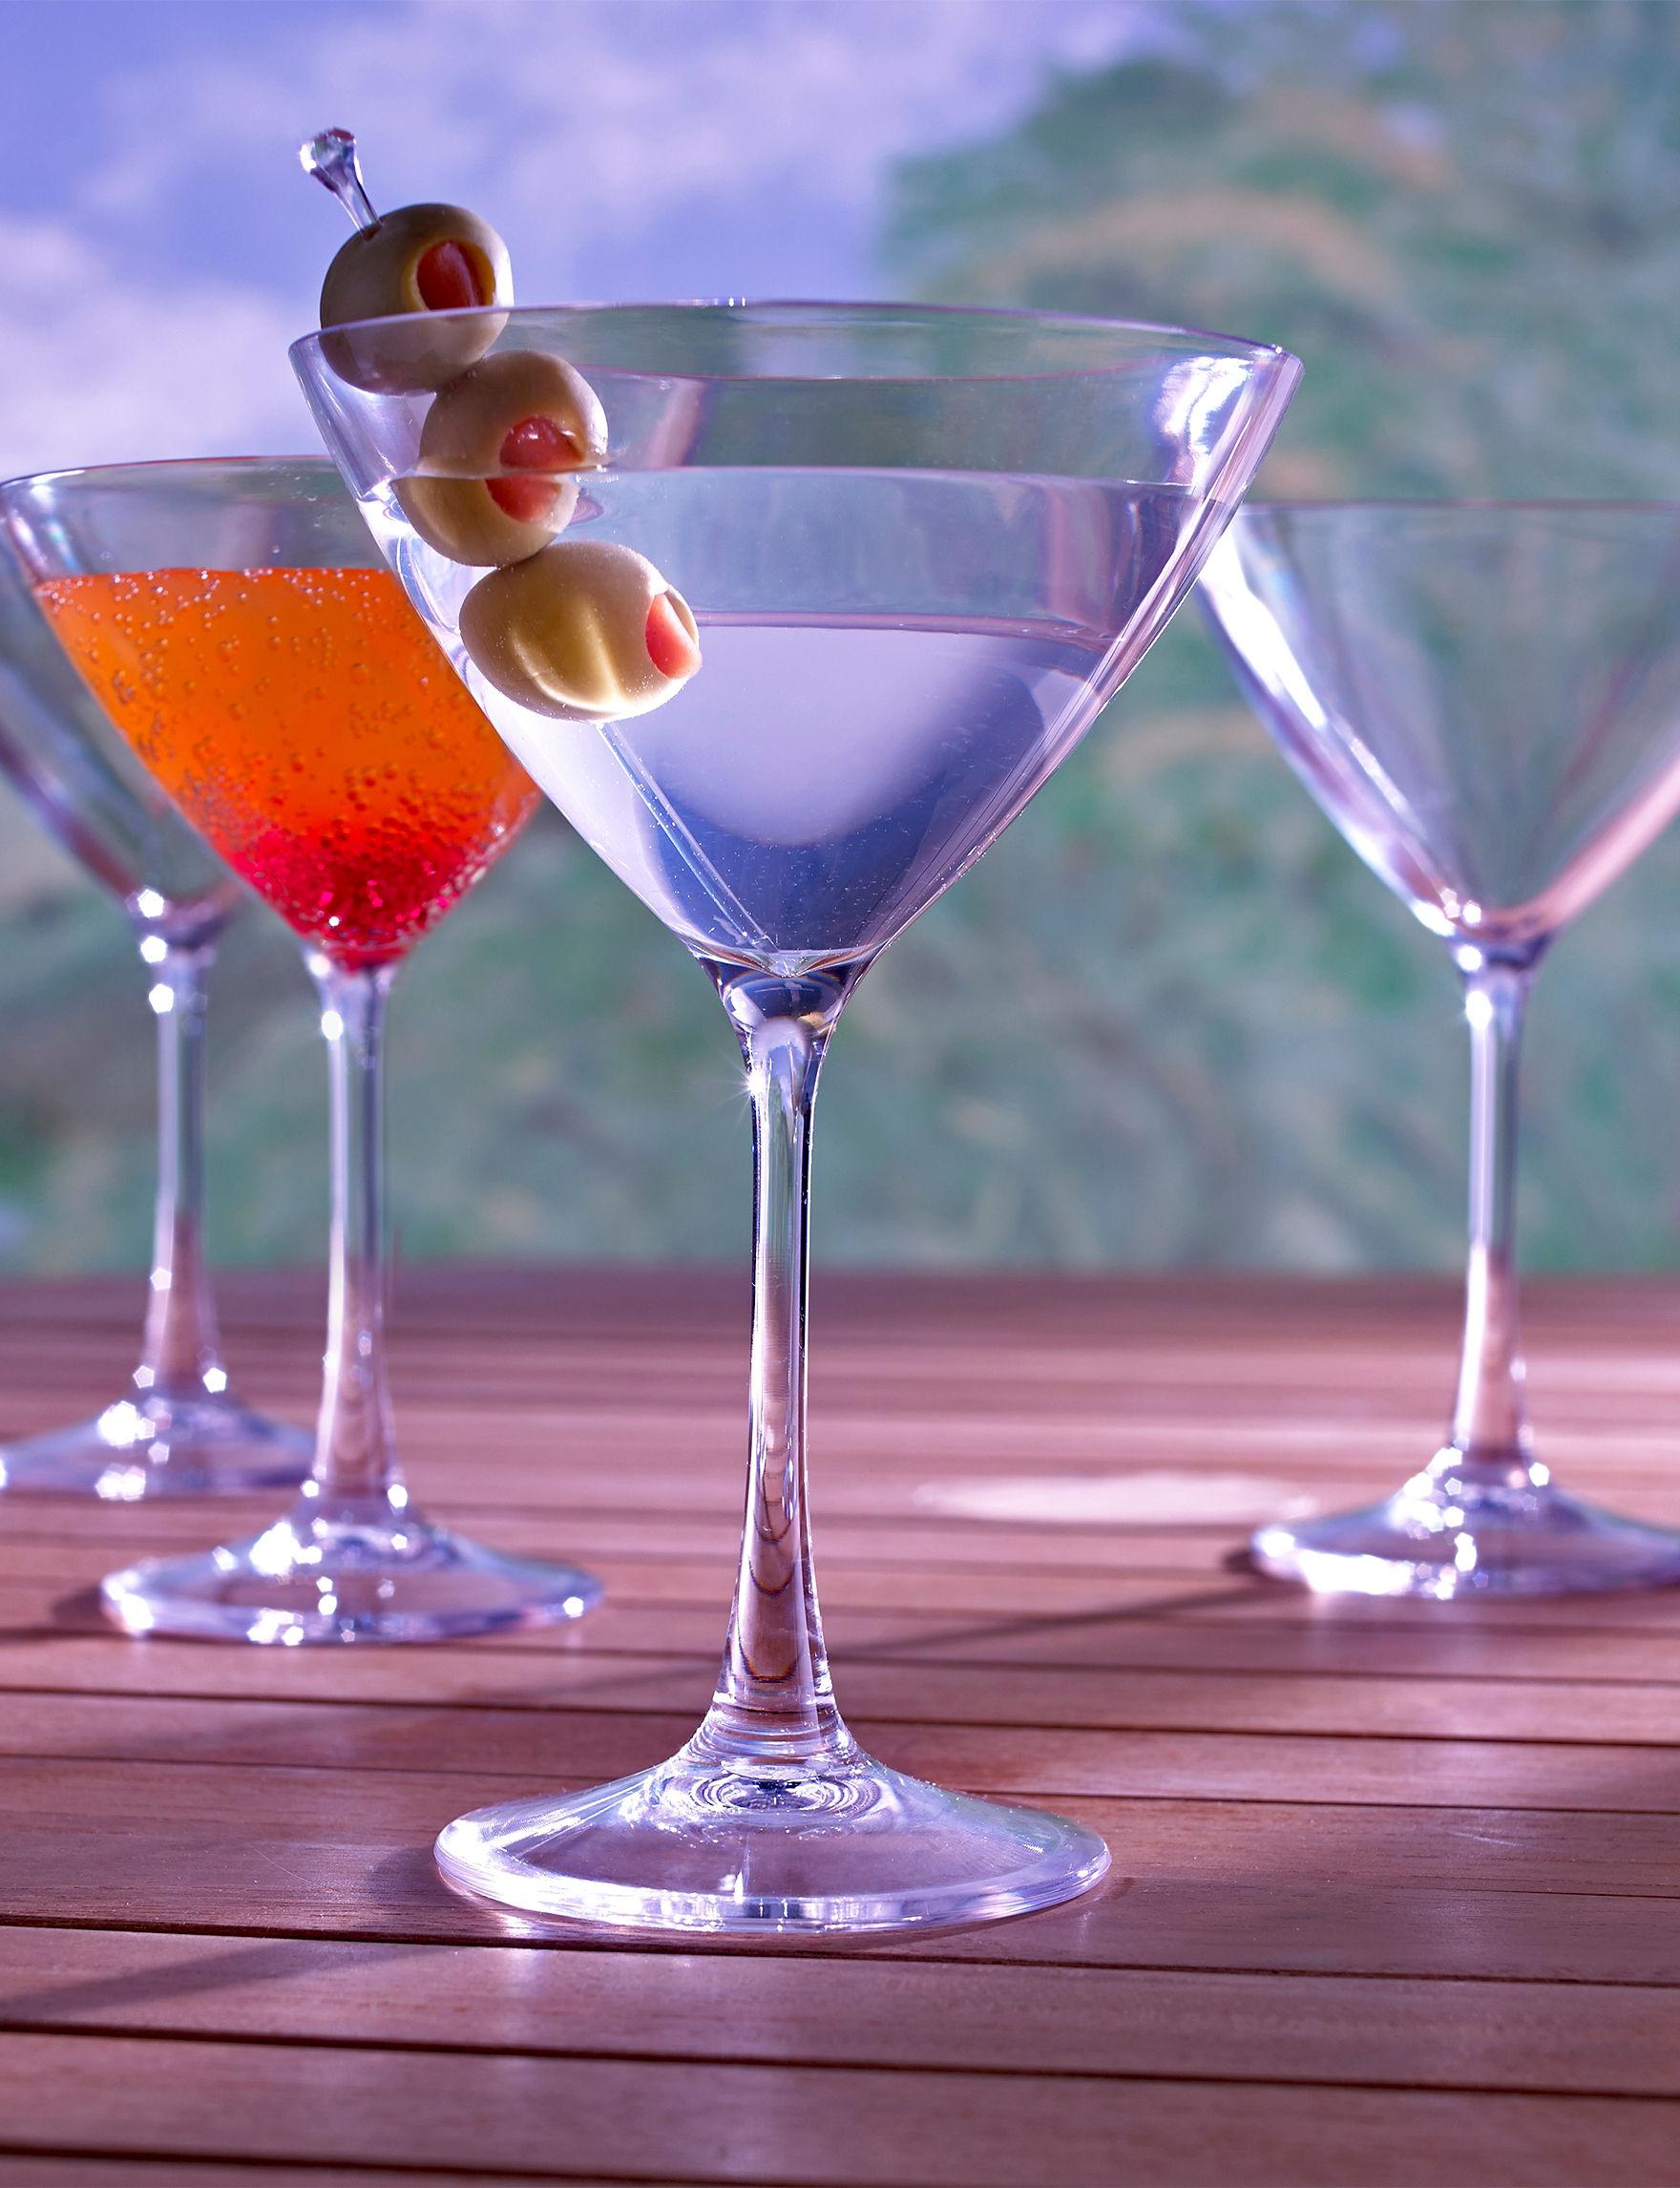 Wine Enthusiast Silver Cocktail & Liquor Glasses Drinkware